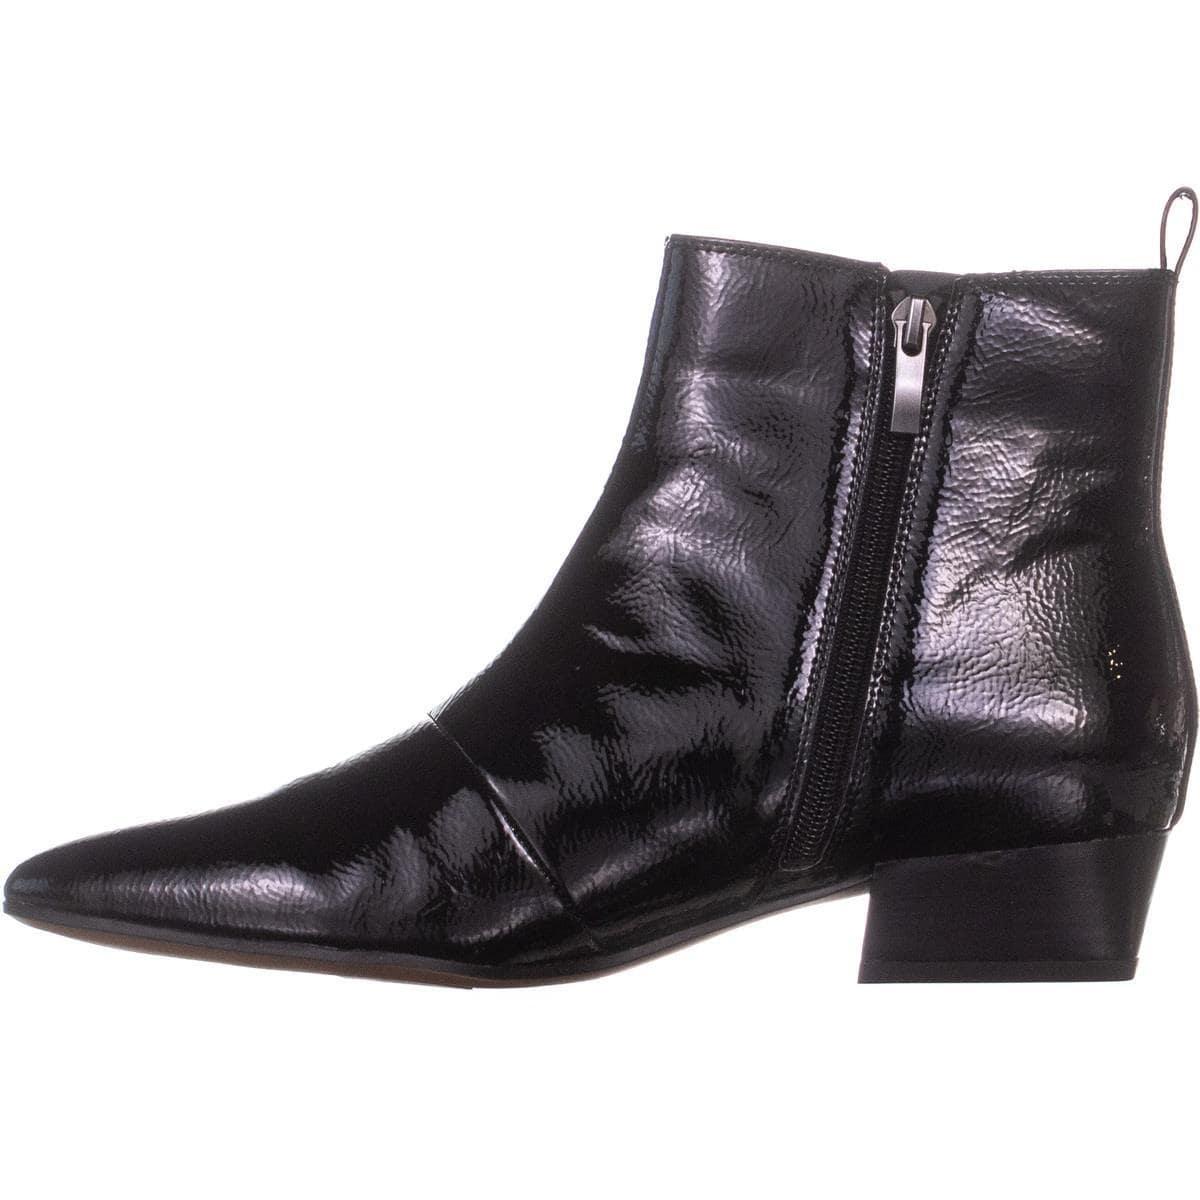 e8d17b0bdb5 Franco Sarto Archie 2 Ankle Boots, Black Patent - 9.5 us / 39.5 eu